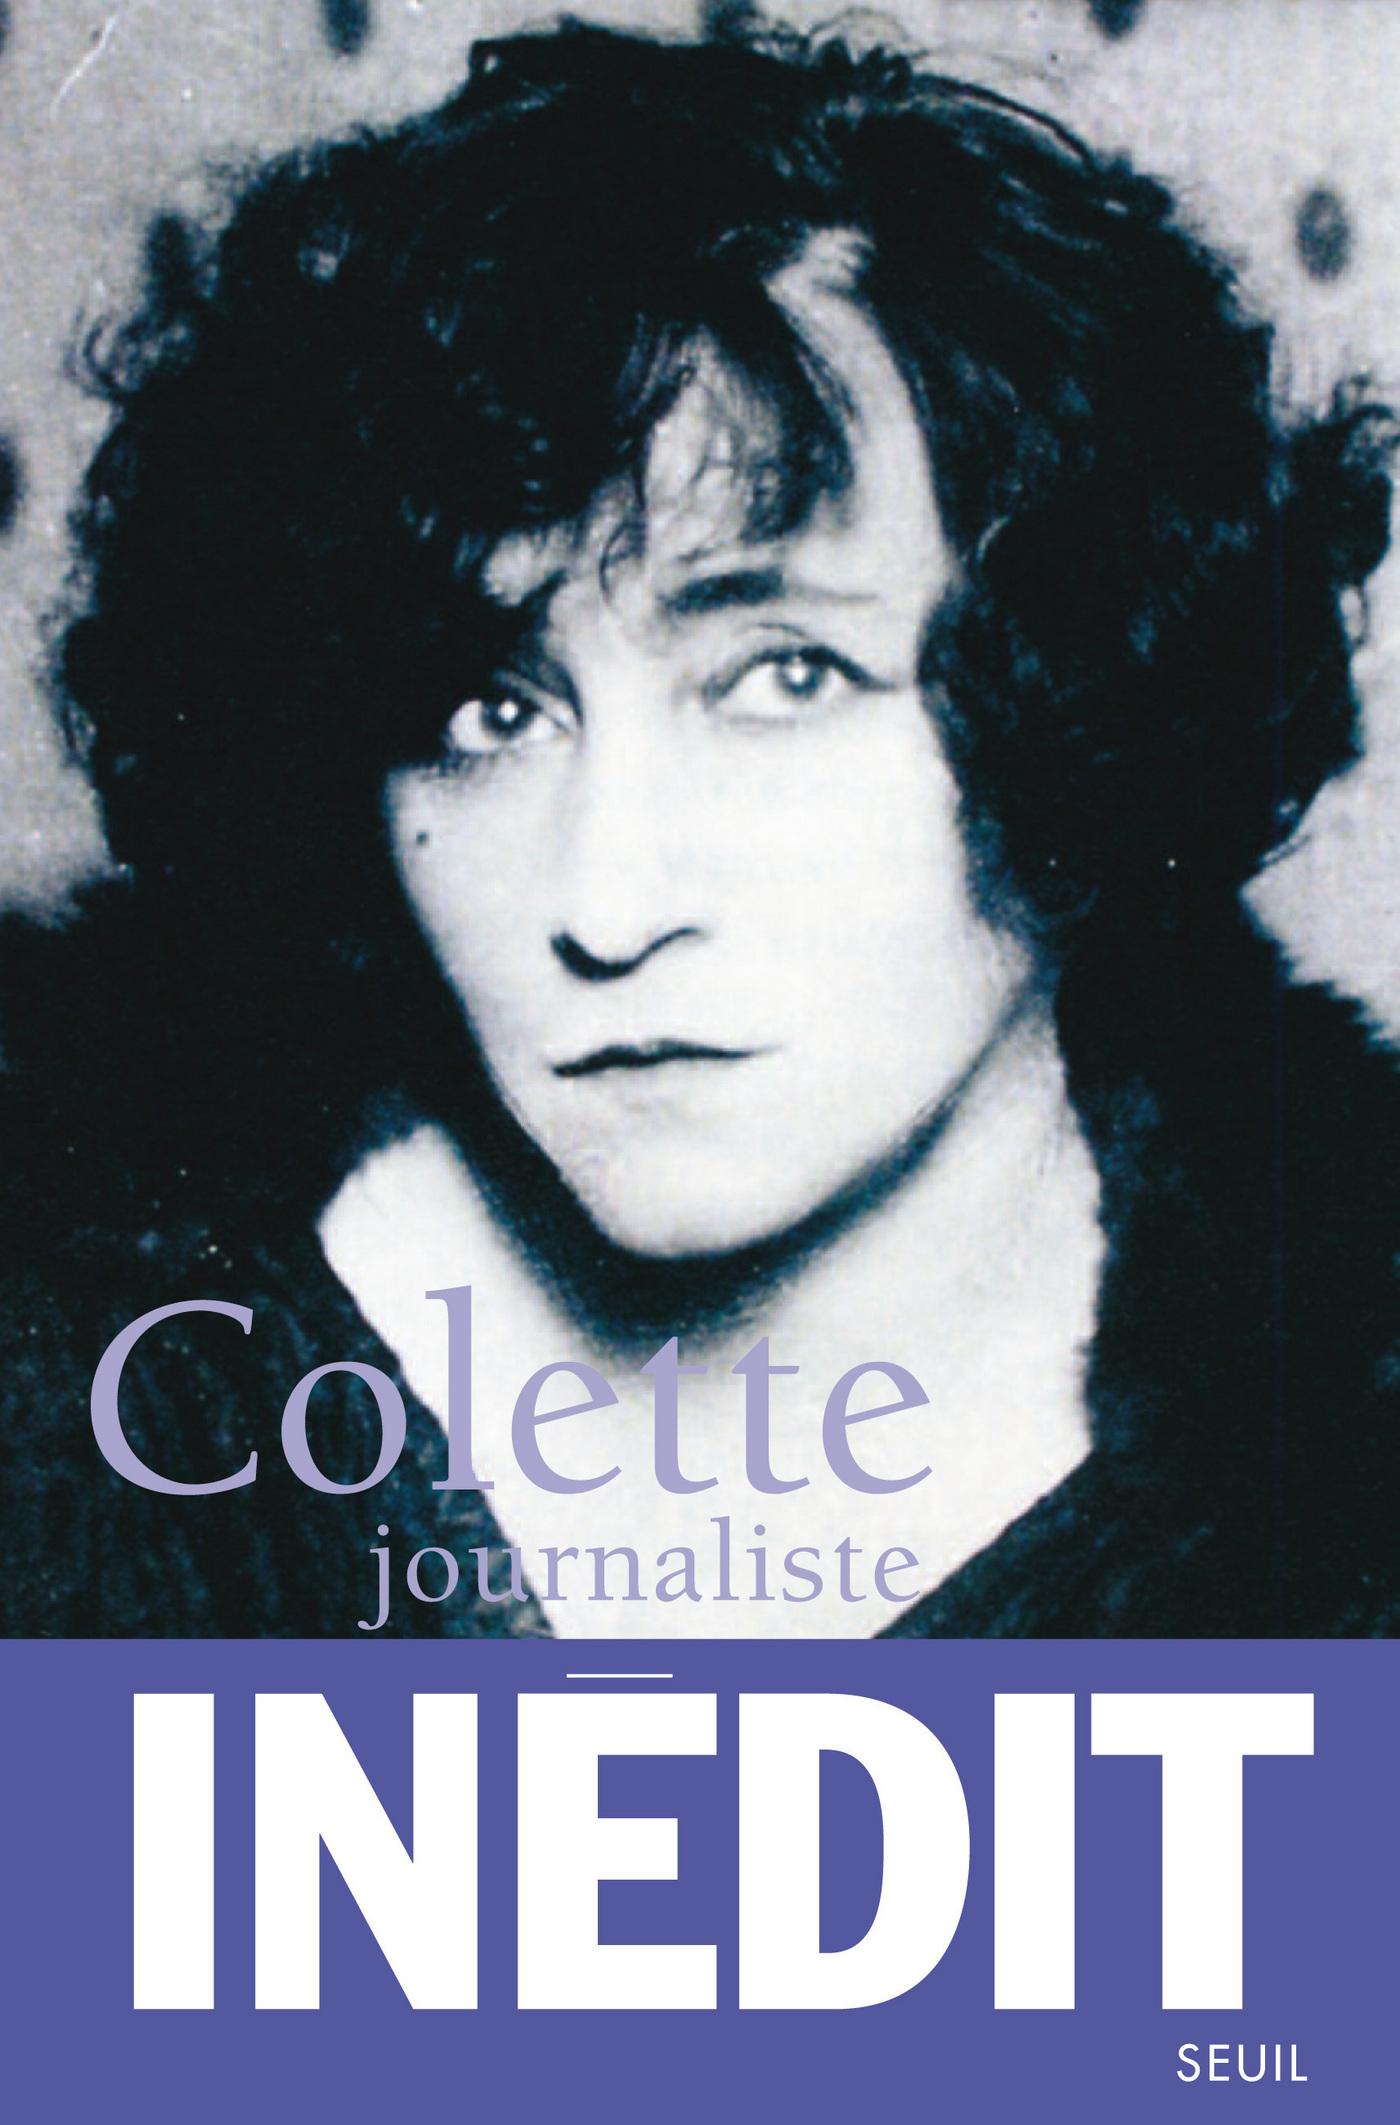 Colette journaliste. Chroni...